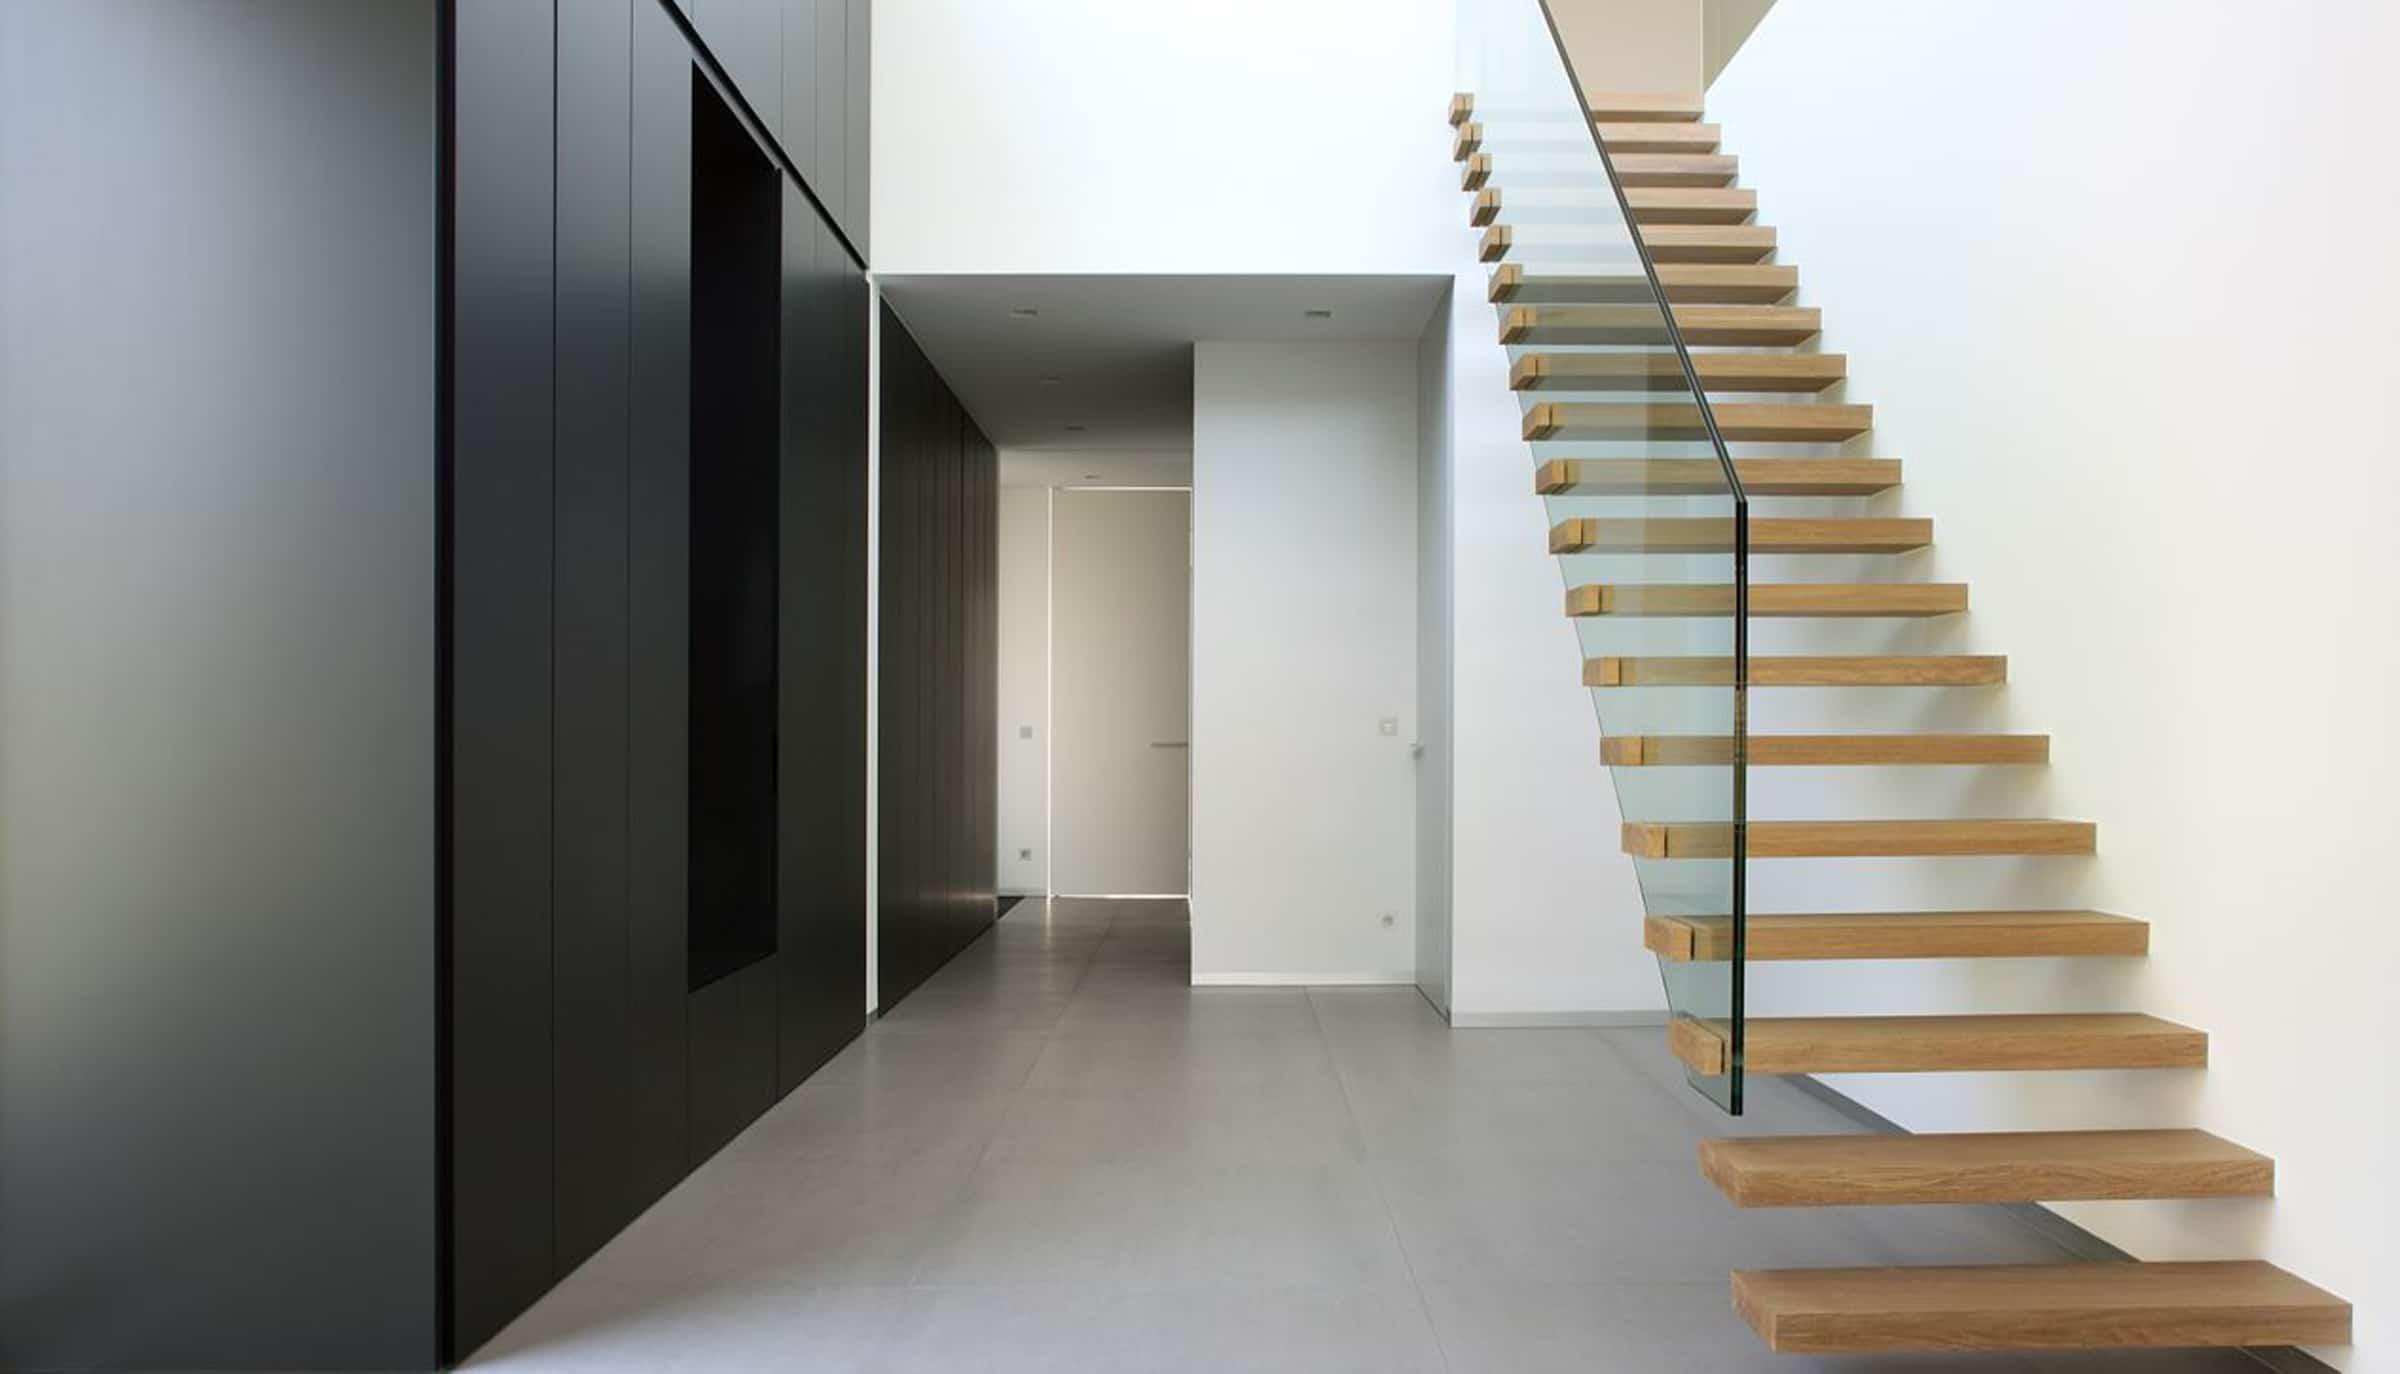 023 Lootens2 | Baeyens & Beck architecten Gent | architect nieuwbouw renovatie interieur | high end | architectenbureau